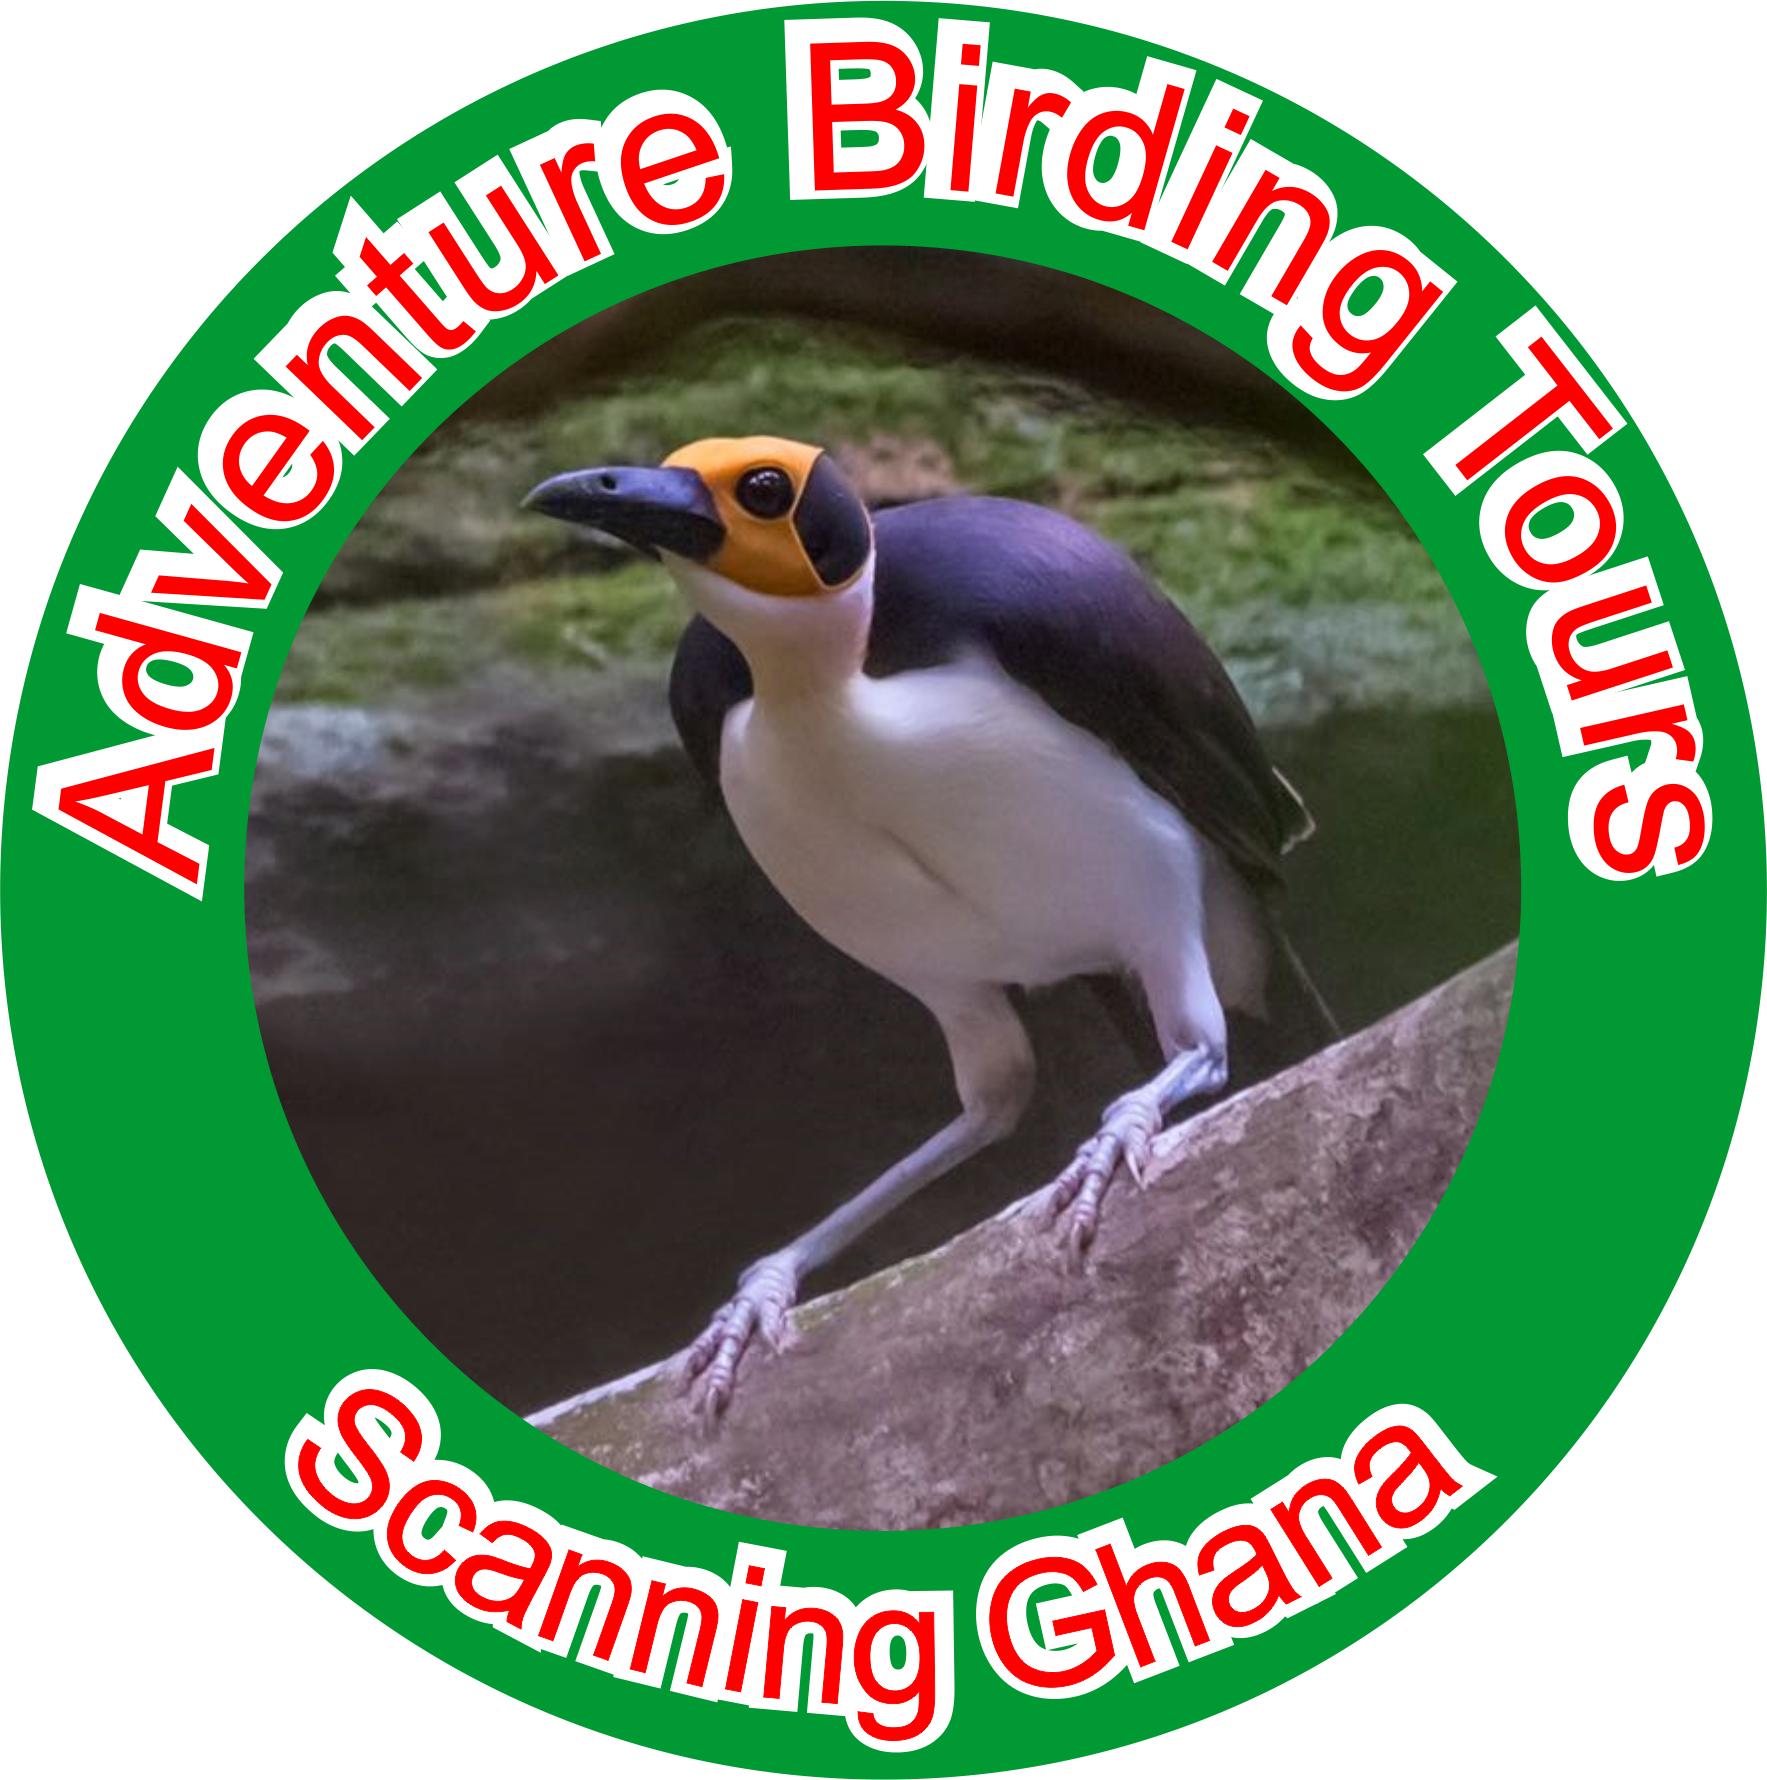 Adventure Birding Tours Ghana